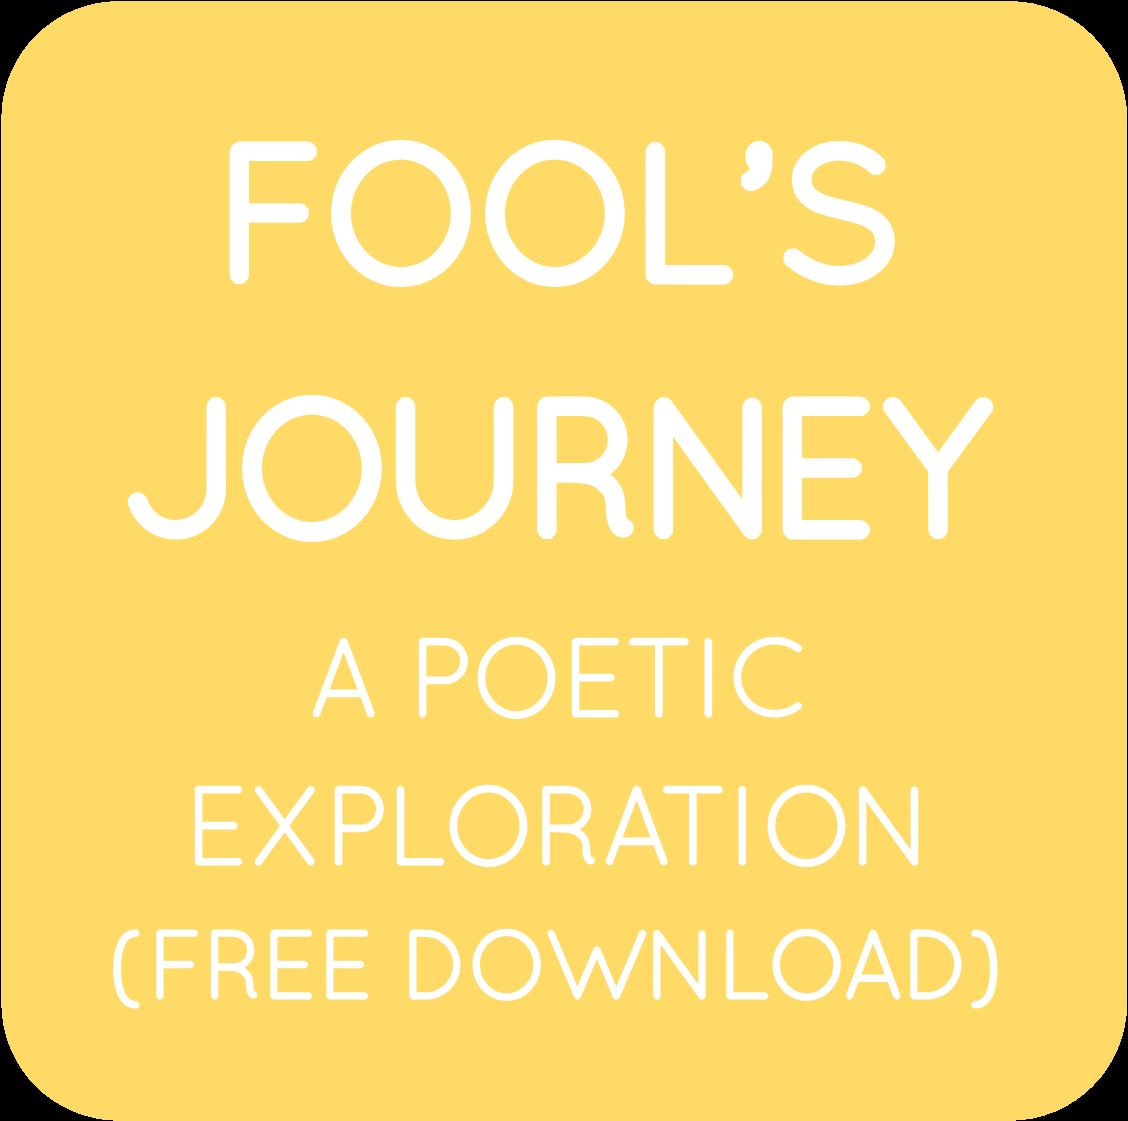 25-fool's journey poetic exploration.png